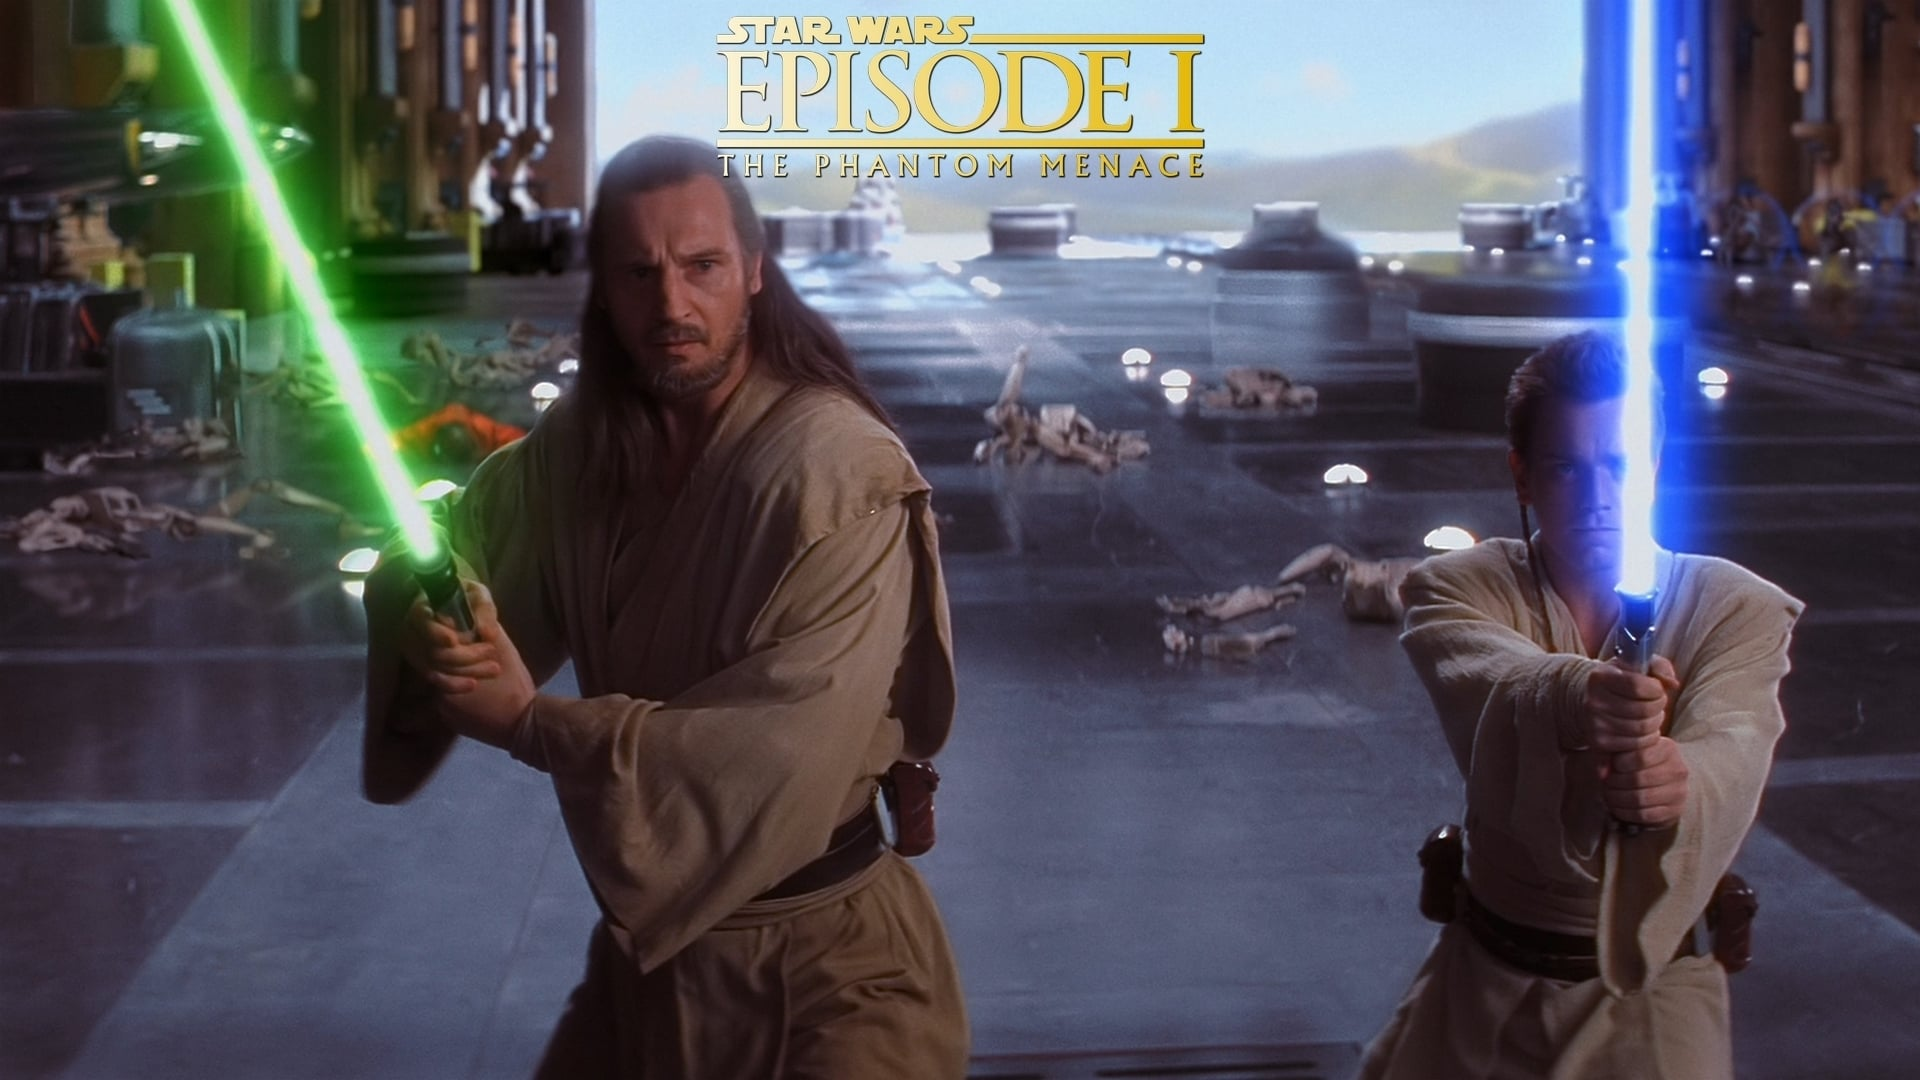 Watch Star Wars: Episode I - The Phantom Menace 1999 Movies Online